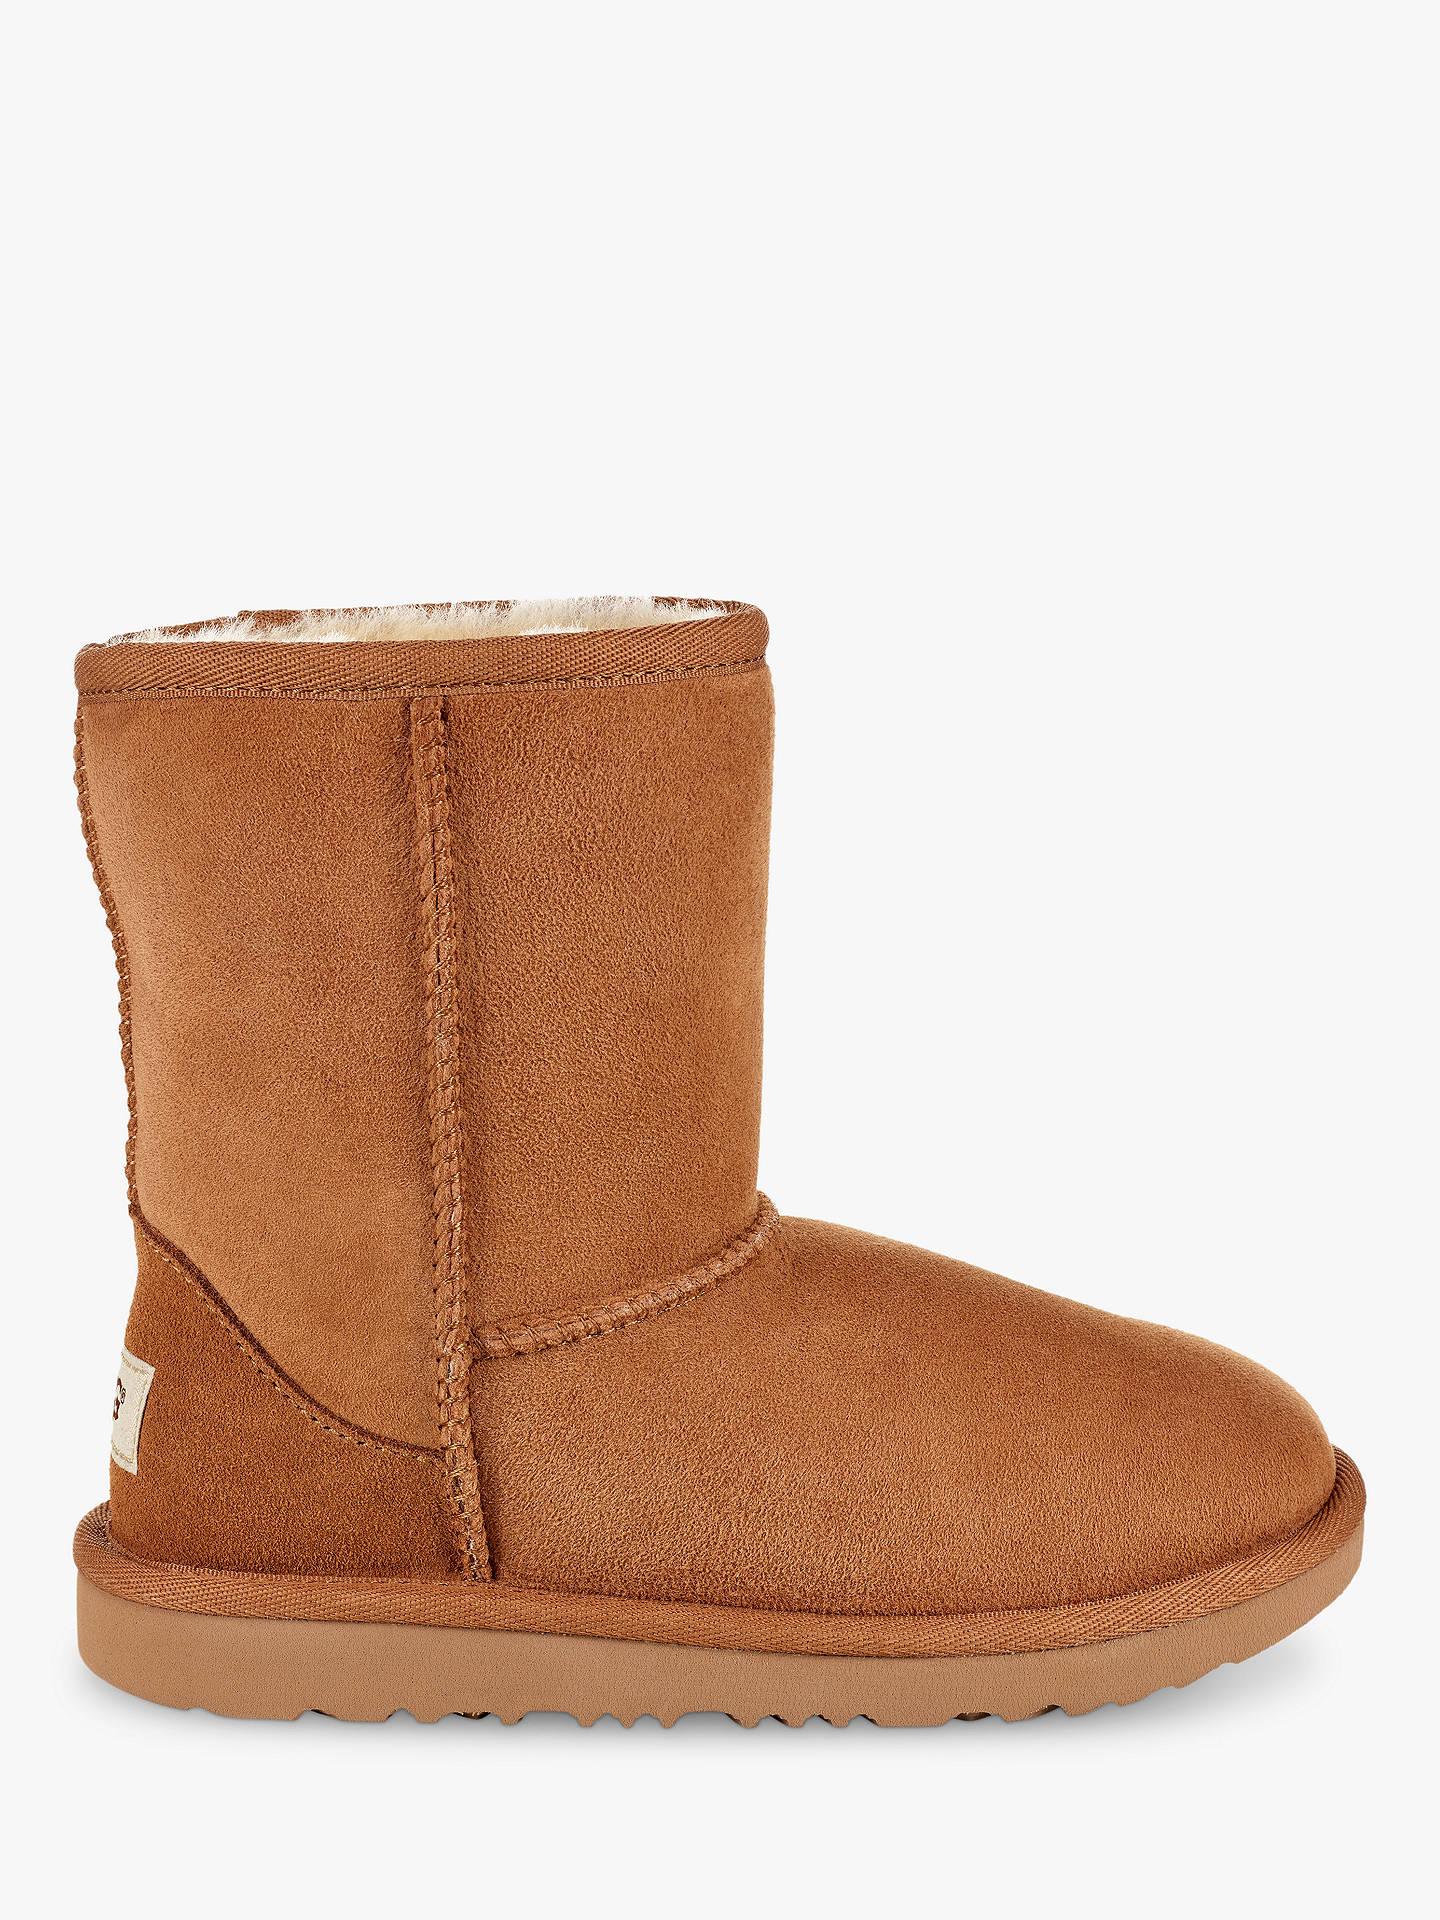 e0fd1cd2da7 UGG Children's Classic Short II Sheepskin Boots, Chestnut